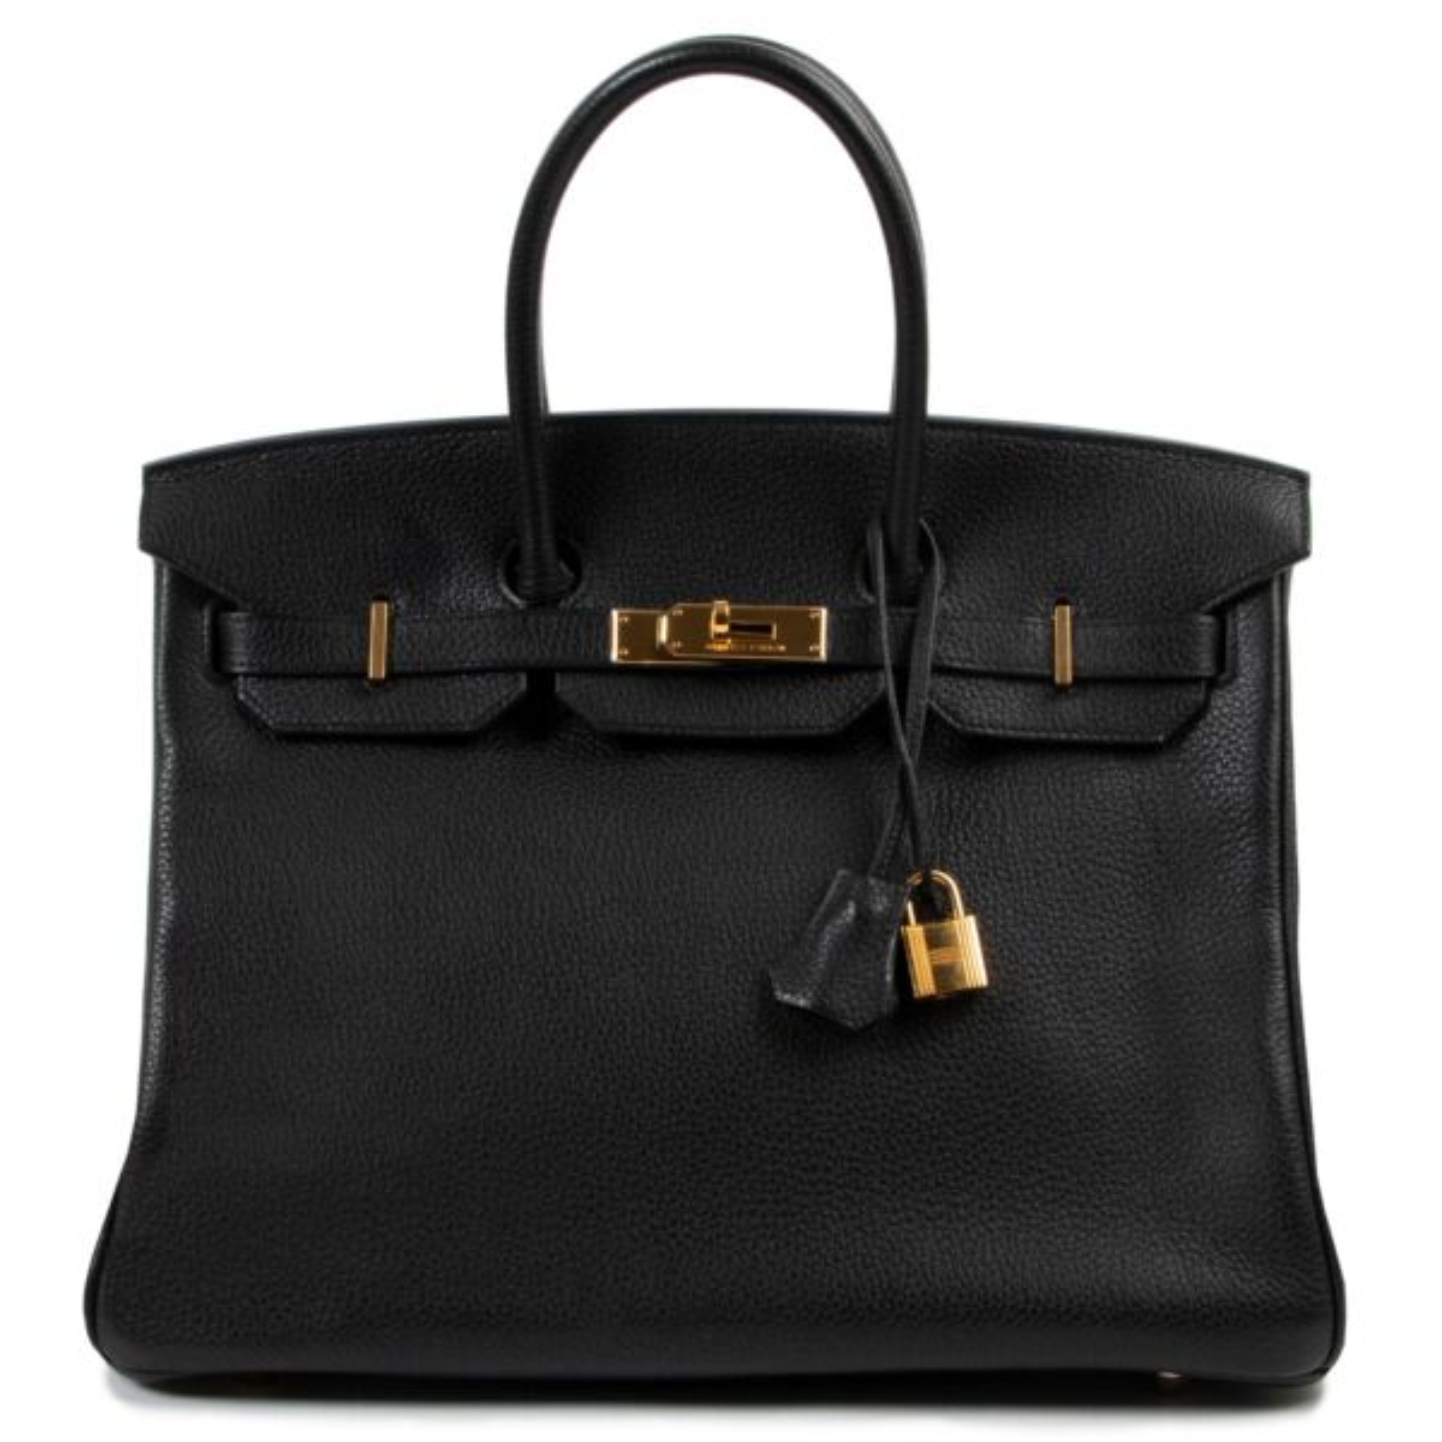 Hermès Birkin 35 Black Togo GHW